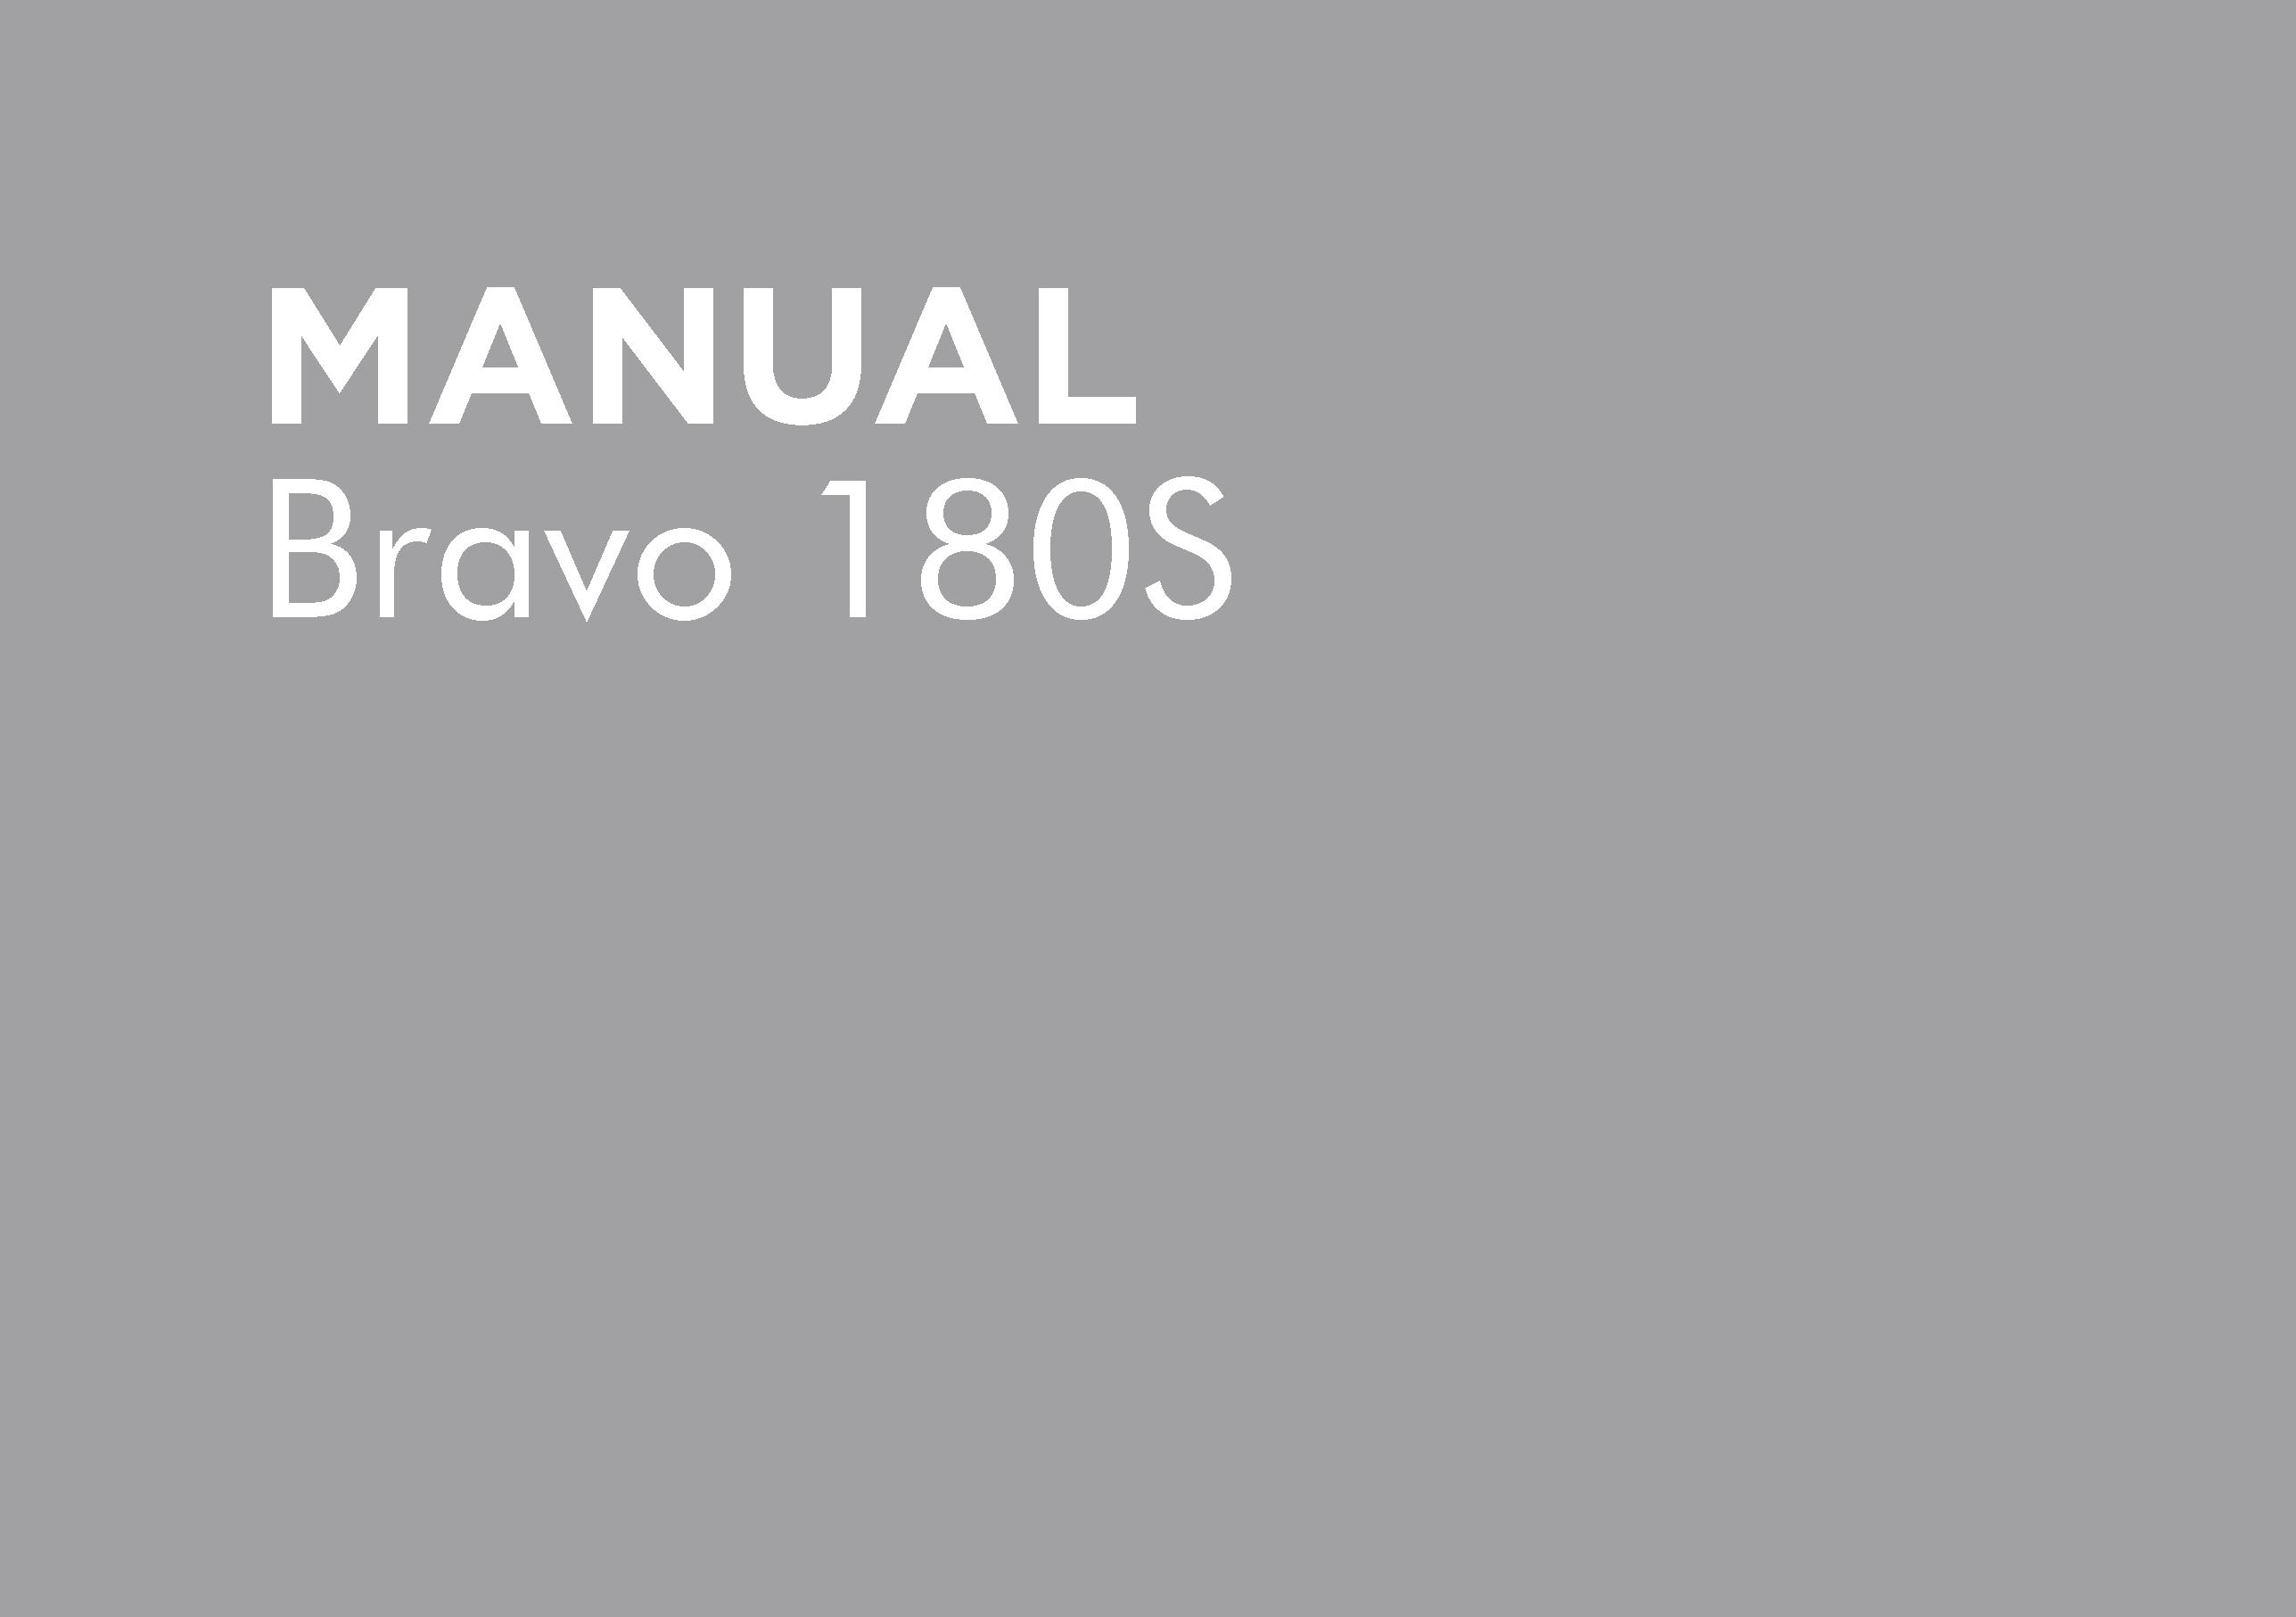 Bravo 180s Crop Sprayer